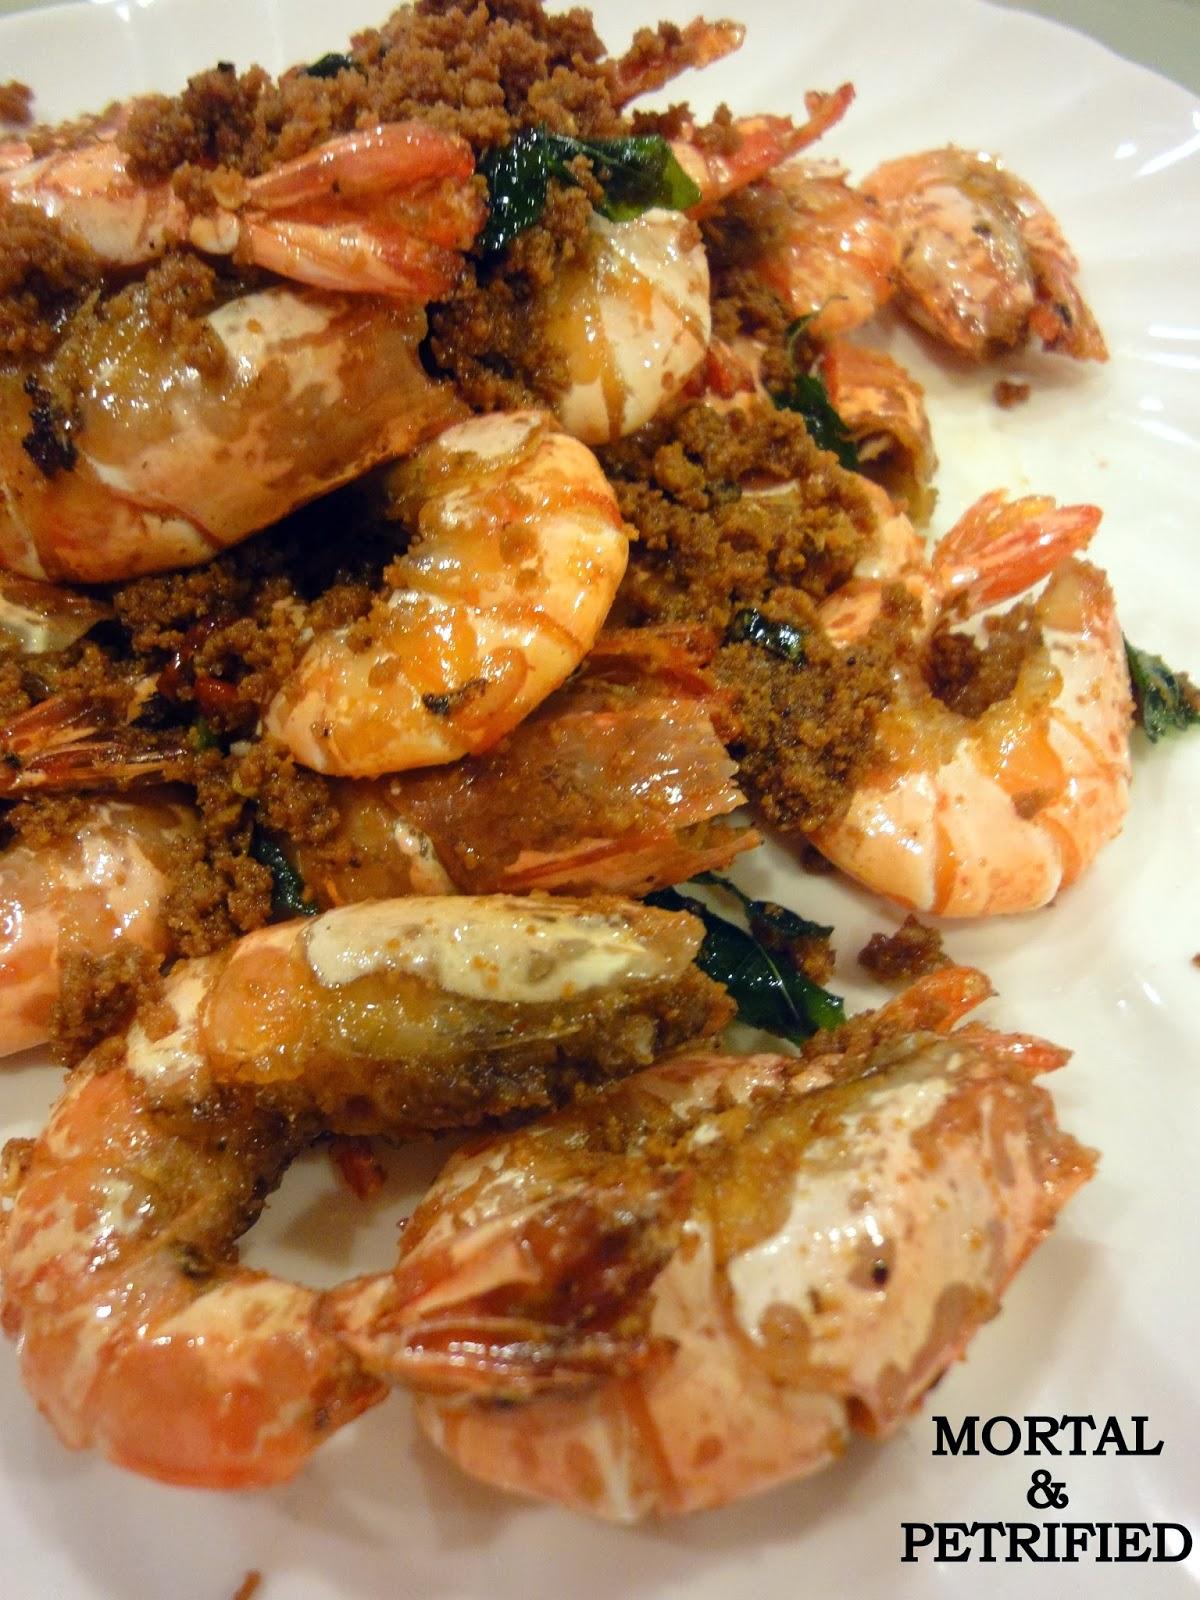 Mortal Amp Petrified 14 Ah Yat Seafood Abalone Restaurant